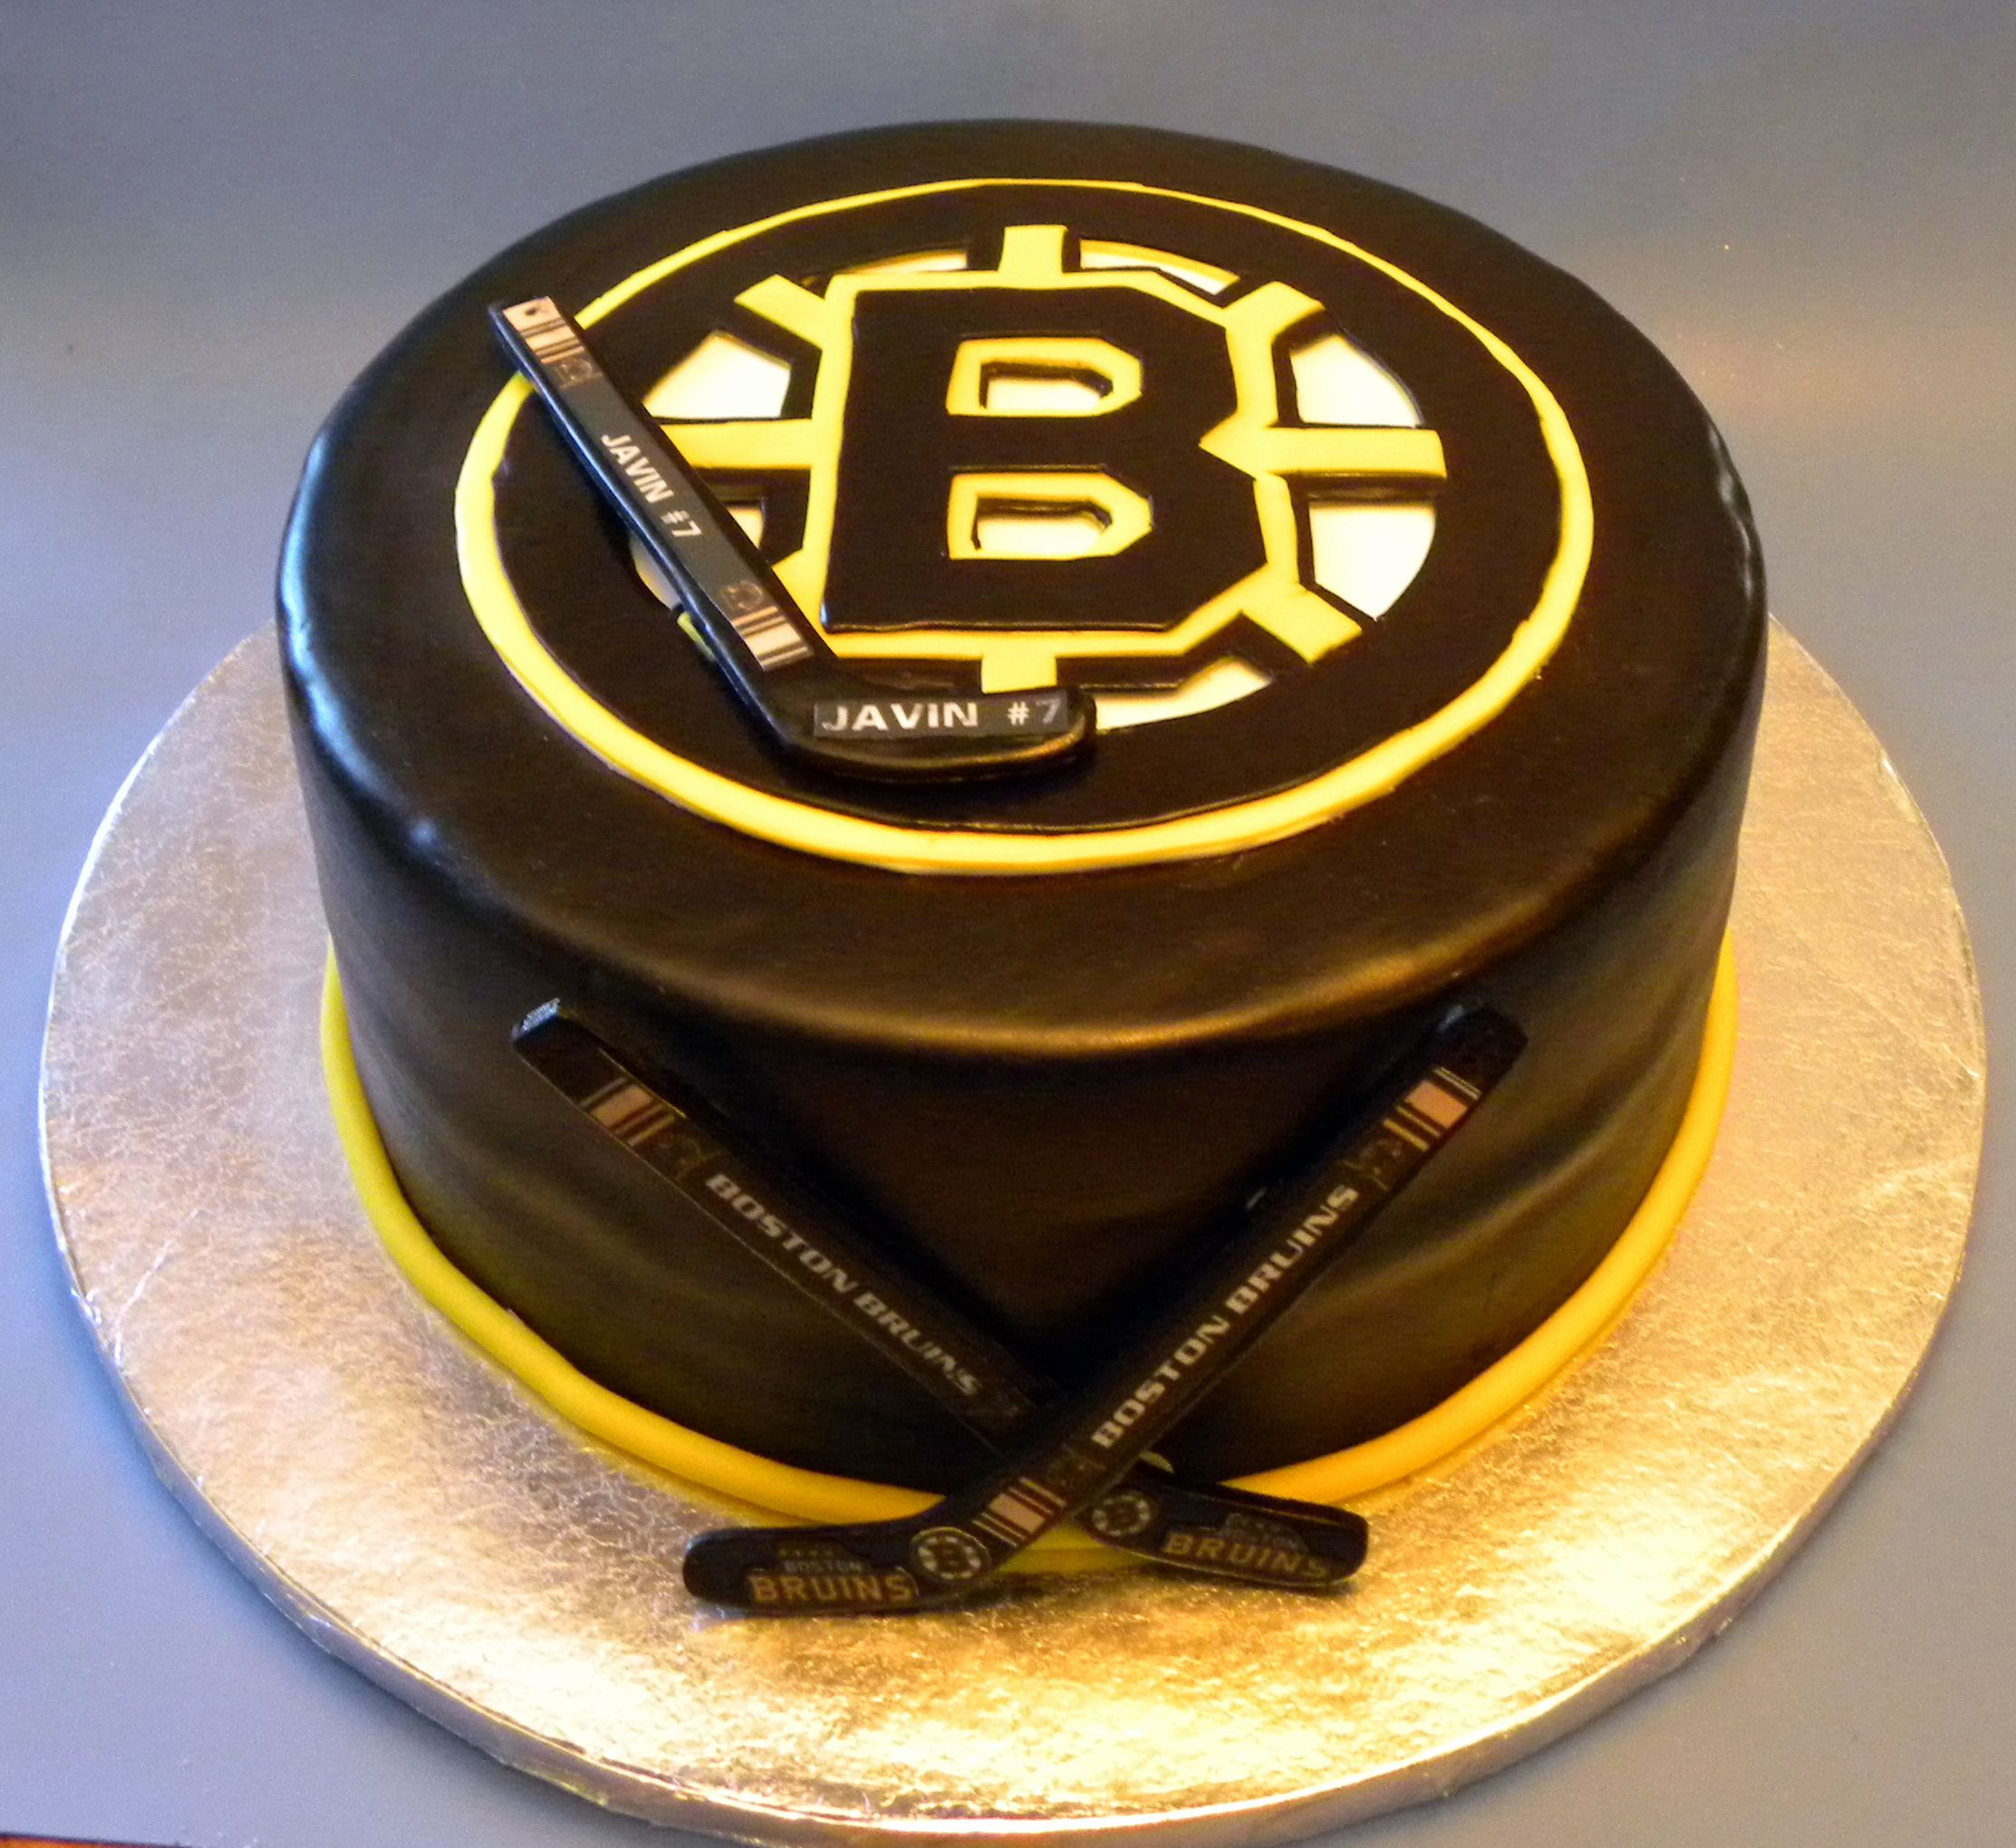 Boston Bruins Cake Decorating Community Cakes We Bake Bruins Love